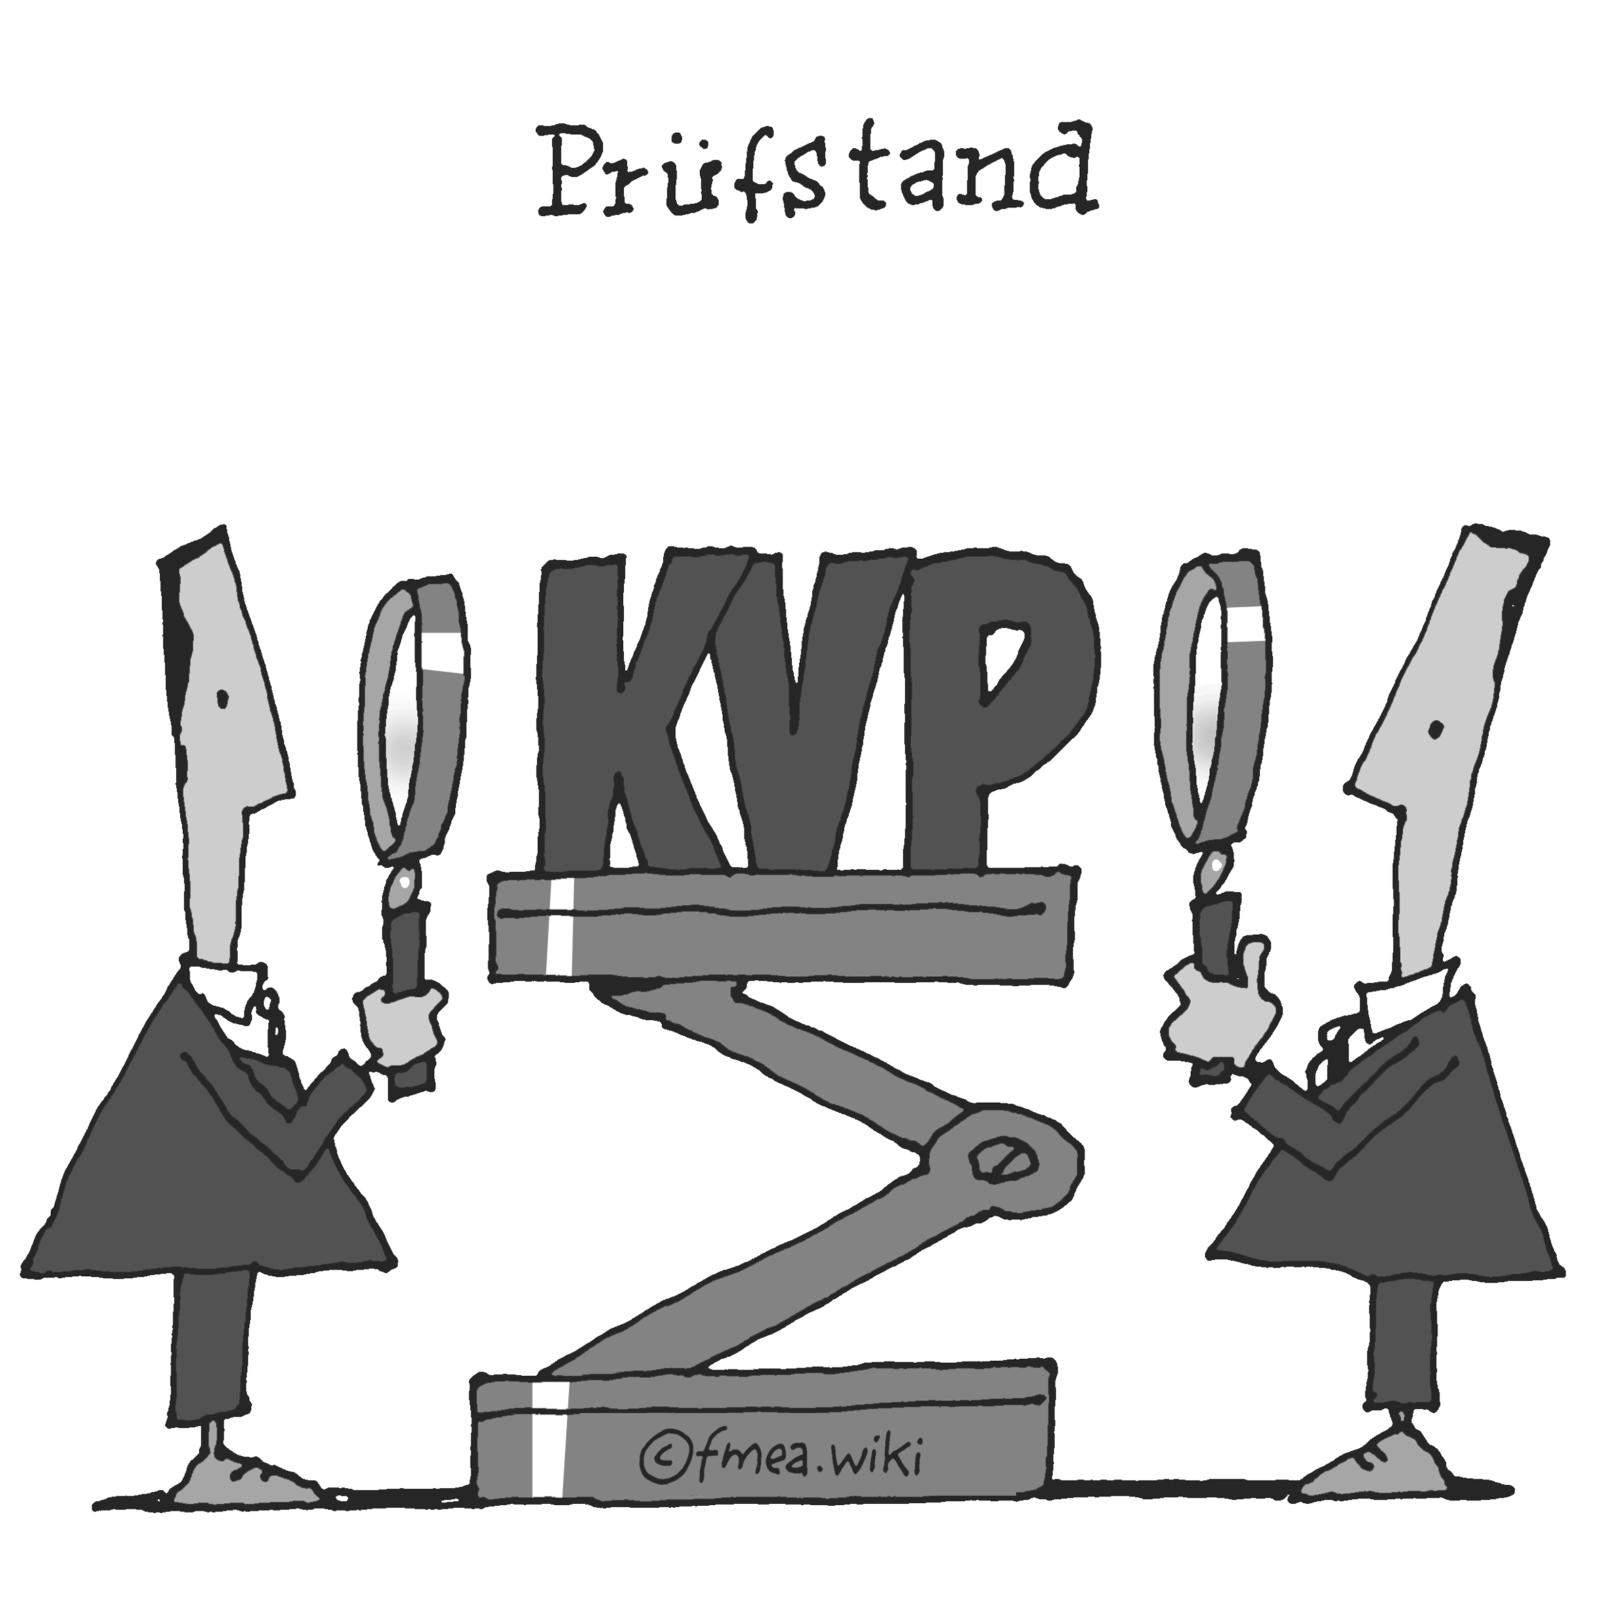 KVP Prüfstand